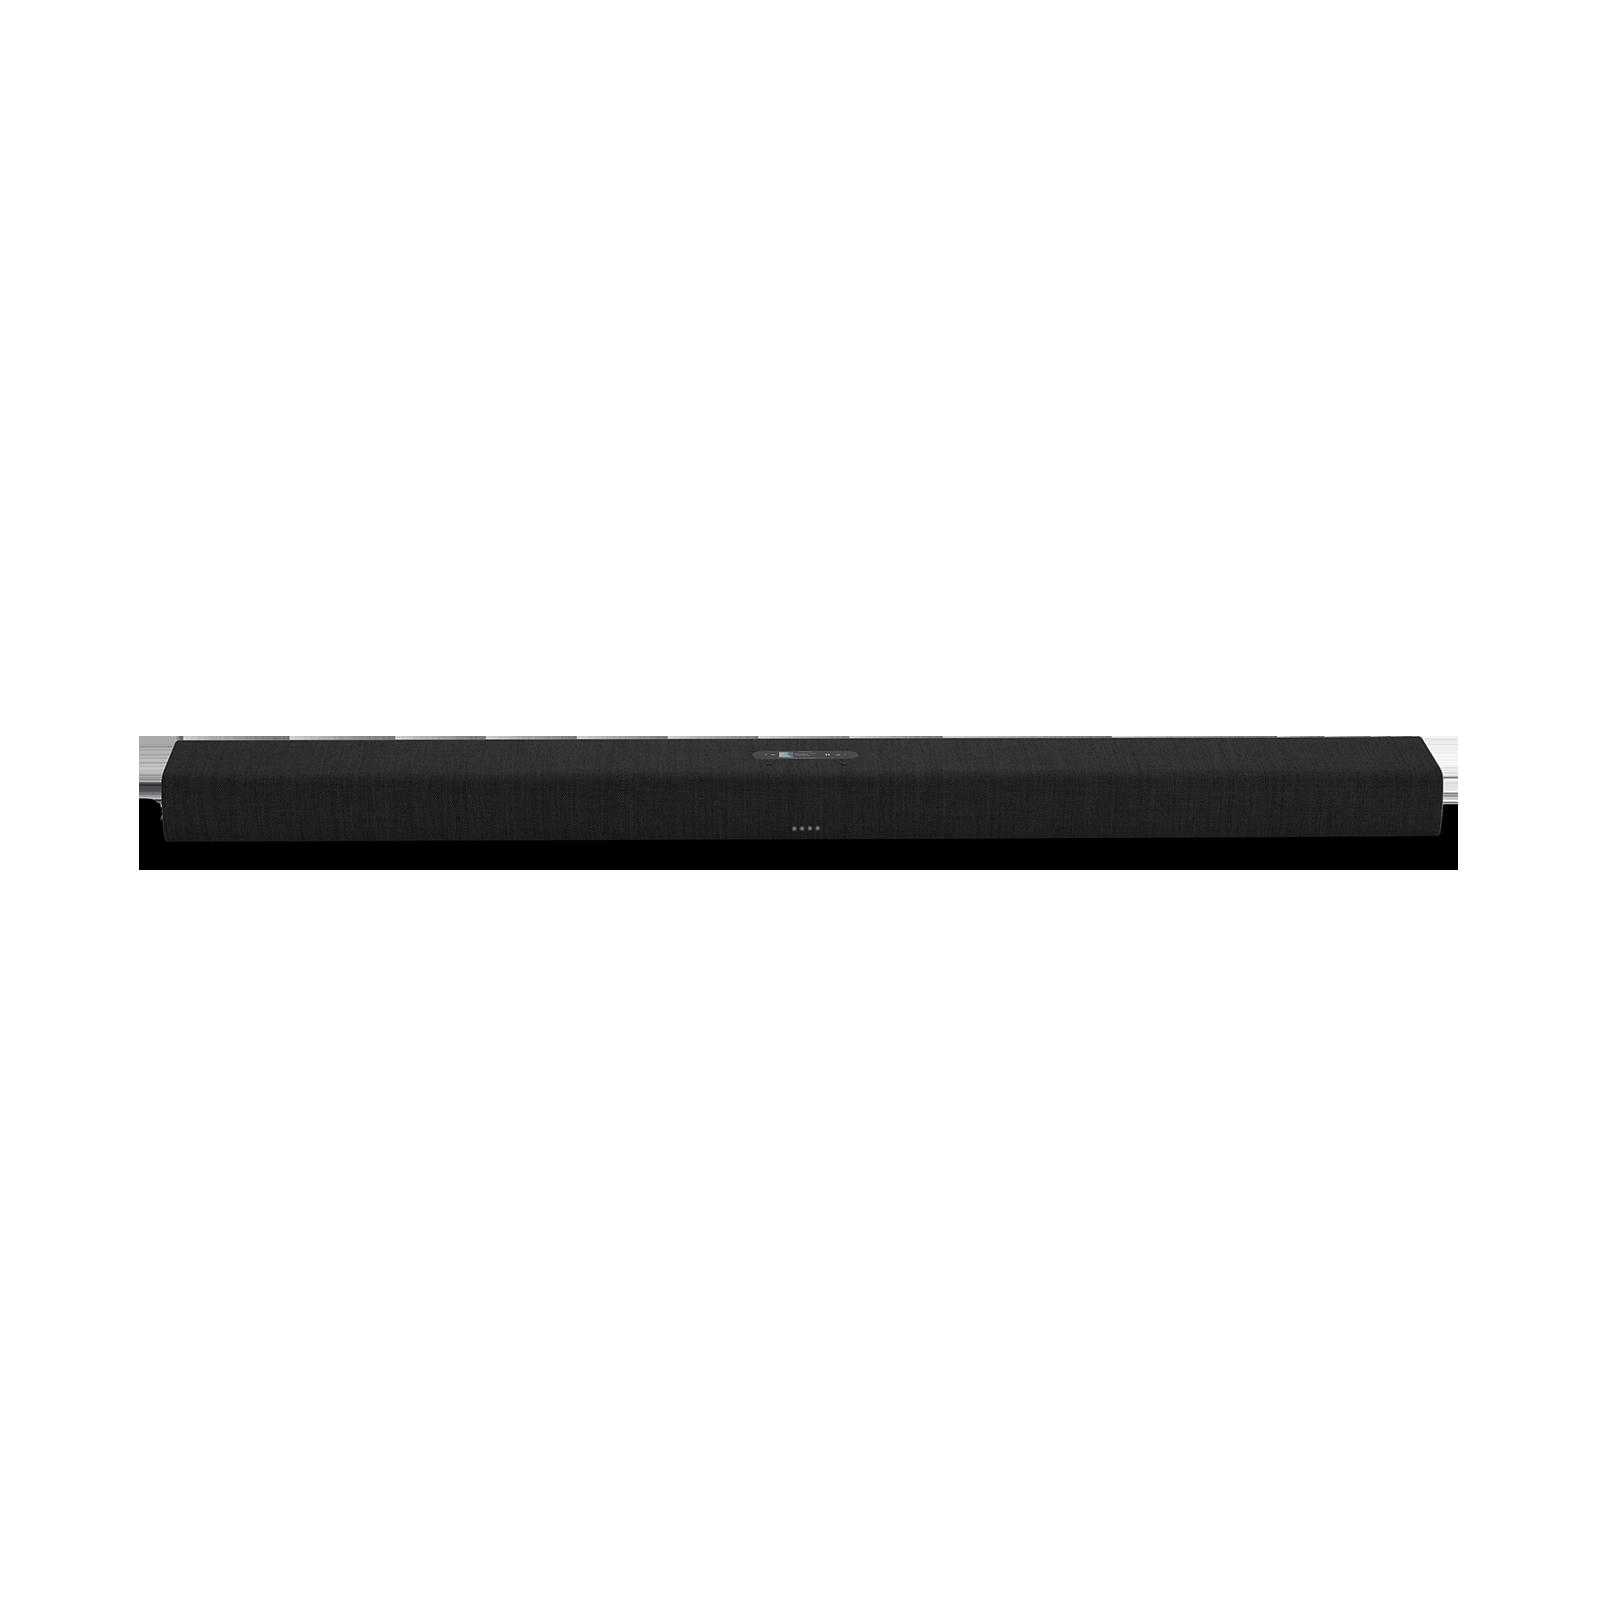 Harman Kardon Citation Bar - Black - The smartest soundbar for movies and music - Front